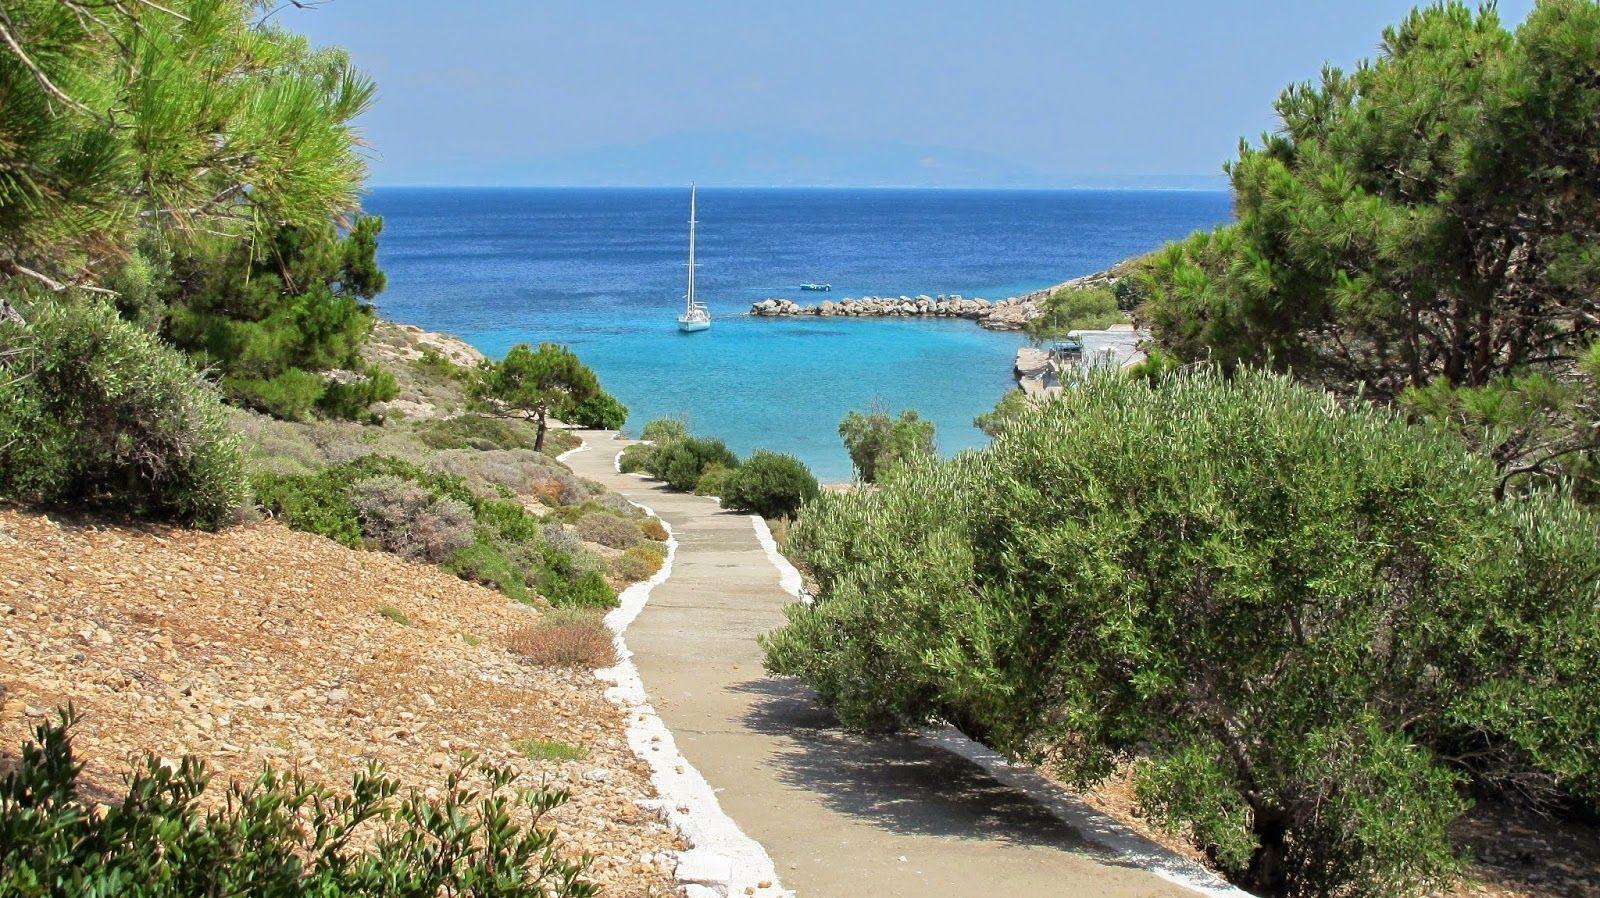 Nera, Kalymnos (Dodecaneso) - Greece